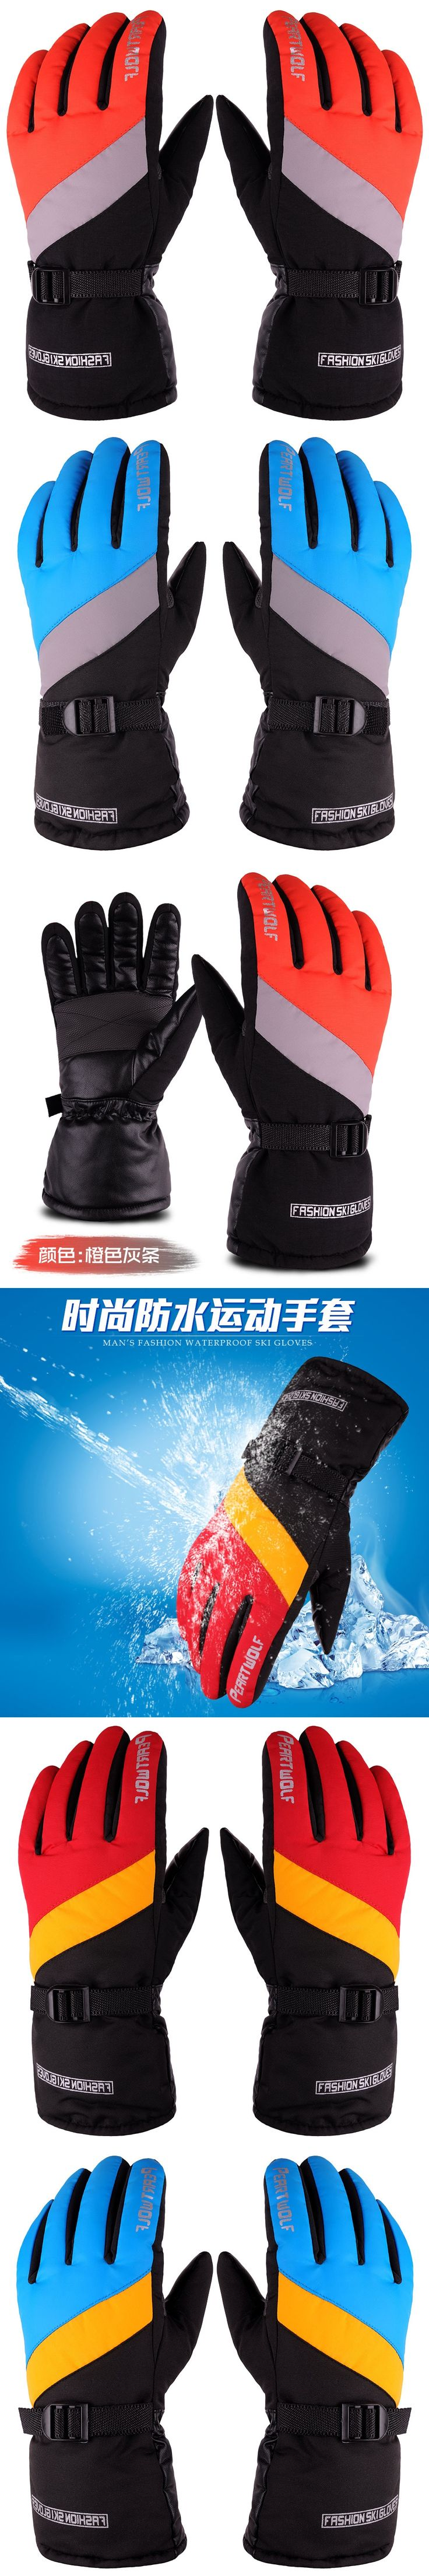 High Quality  Winter Men Gloves Outdoor Sport Warm Wool Waterproof Glove Antiskid Full Finger